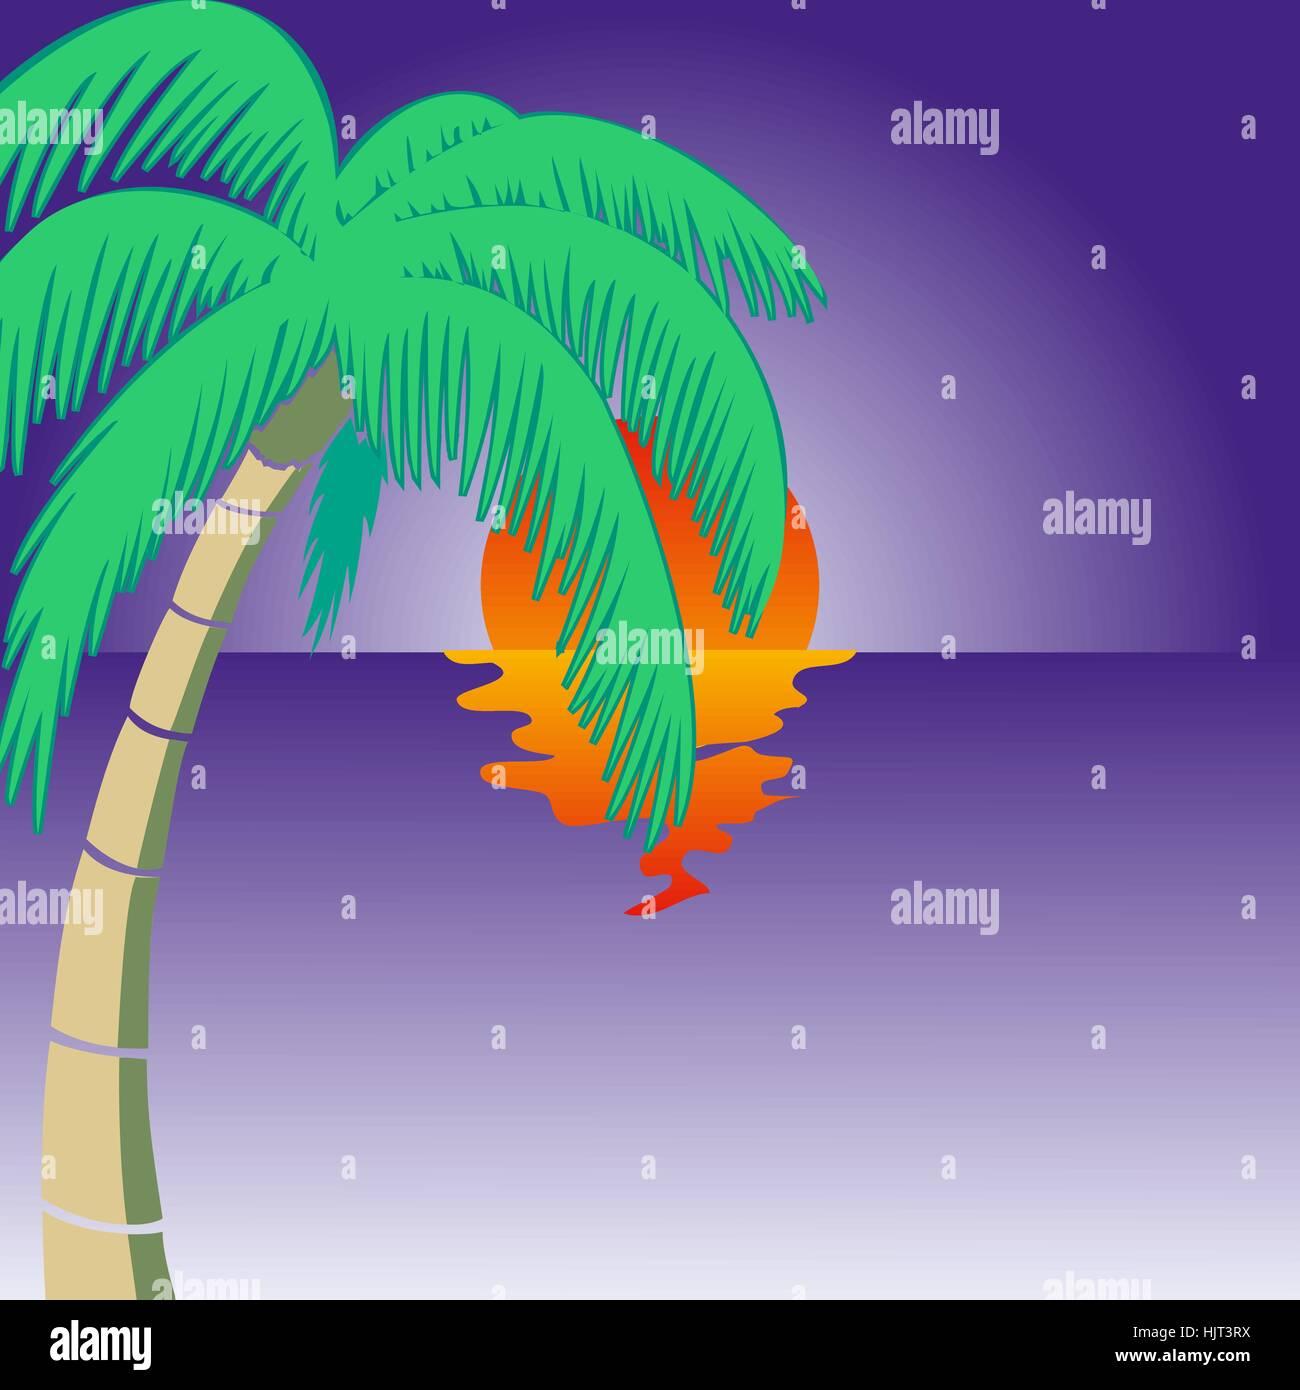 Summer holidays background. Seaside View Poster. Vector beach resort wallpaper - Stock Vector